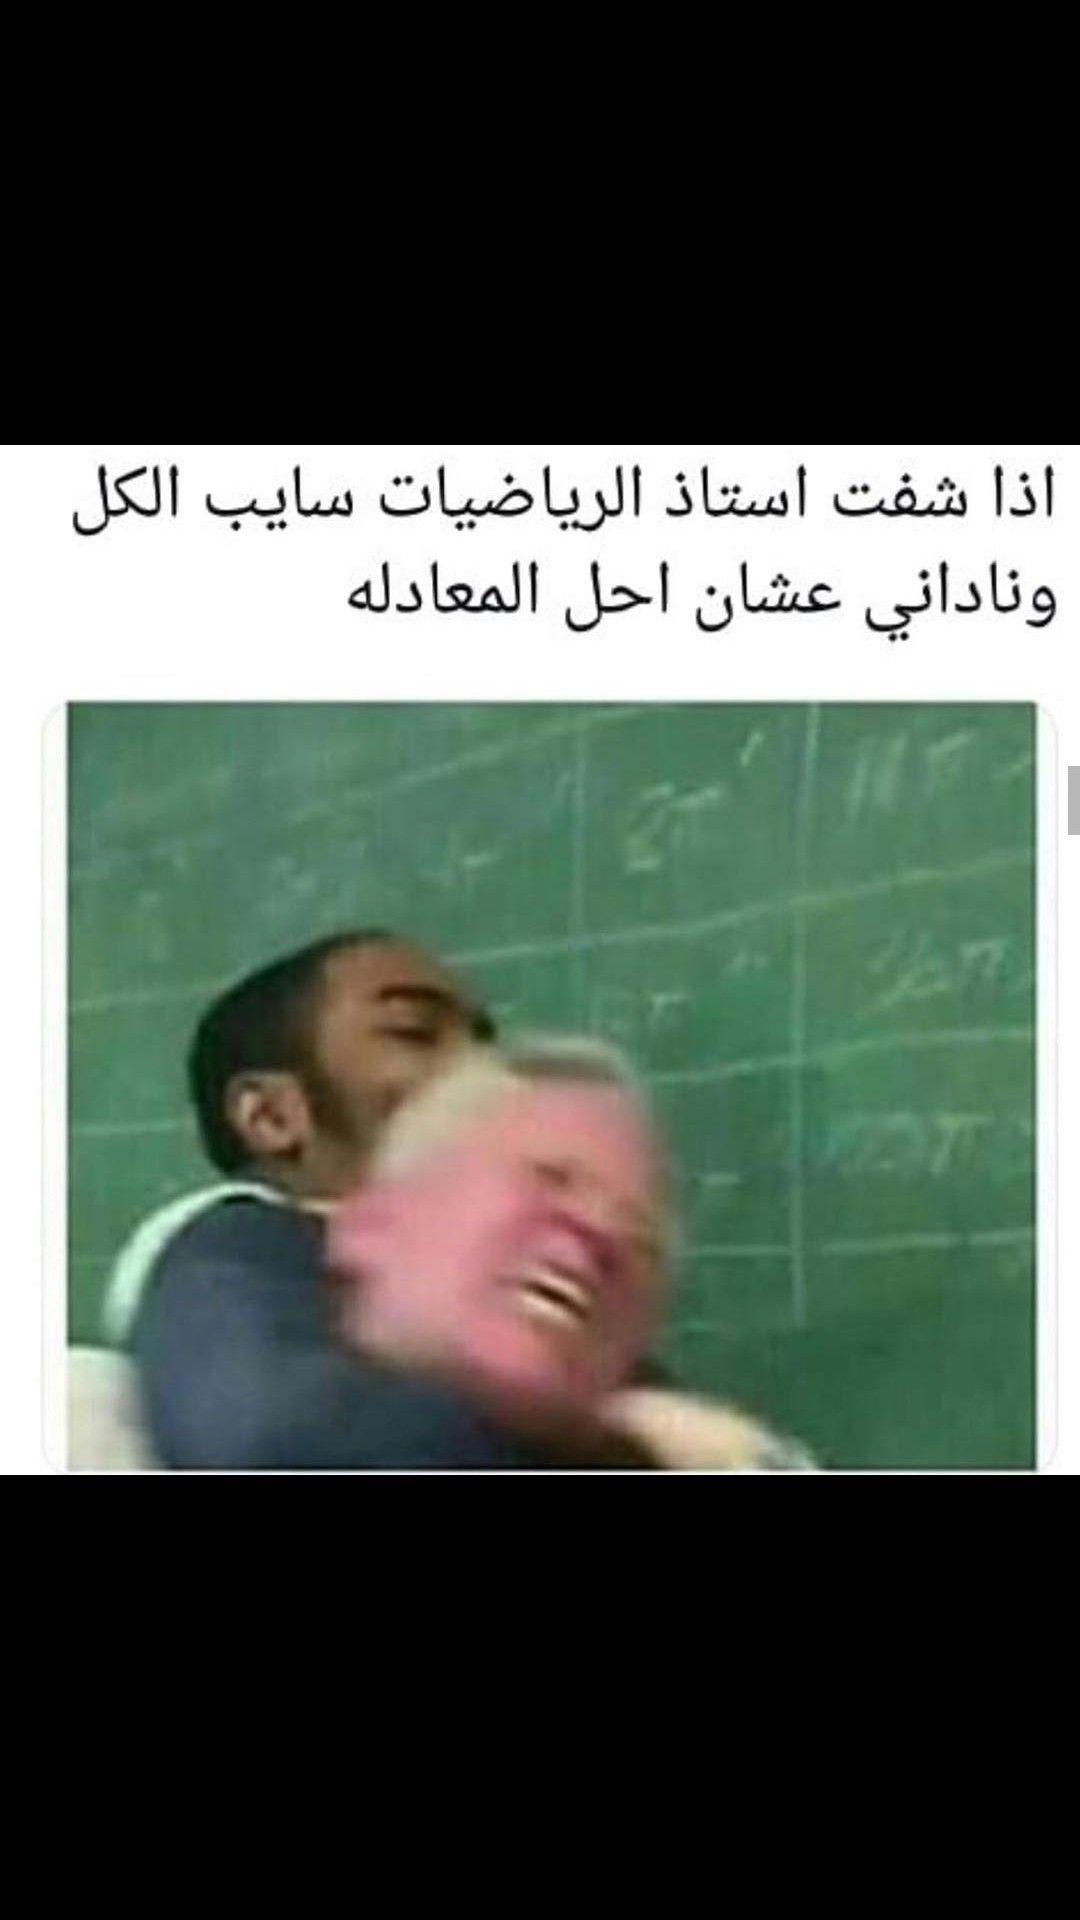 تخيلي تصير والله غير افرط ضحك Really Funny Memes Funny Arabic Quotes Funny Comments